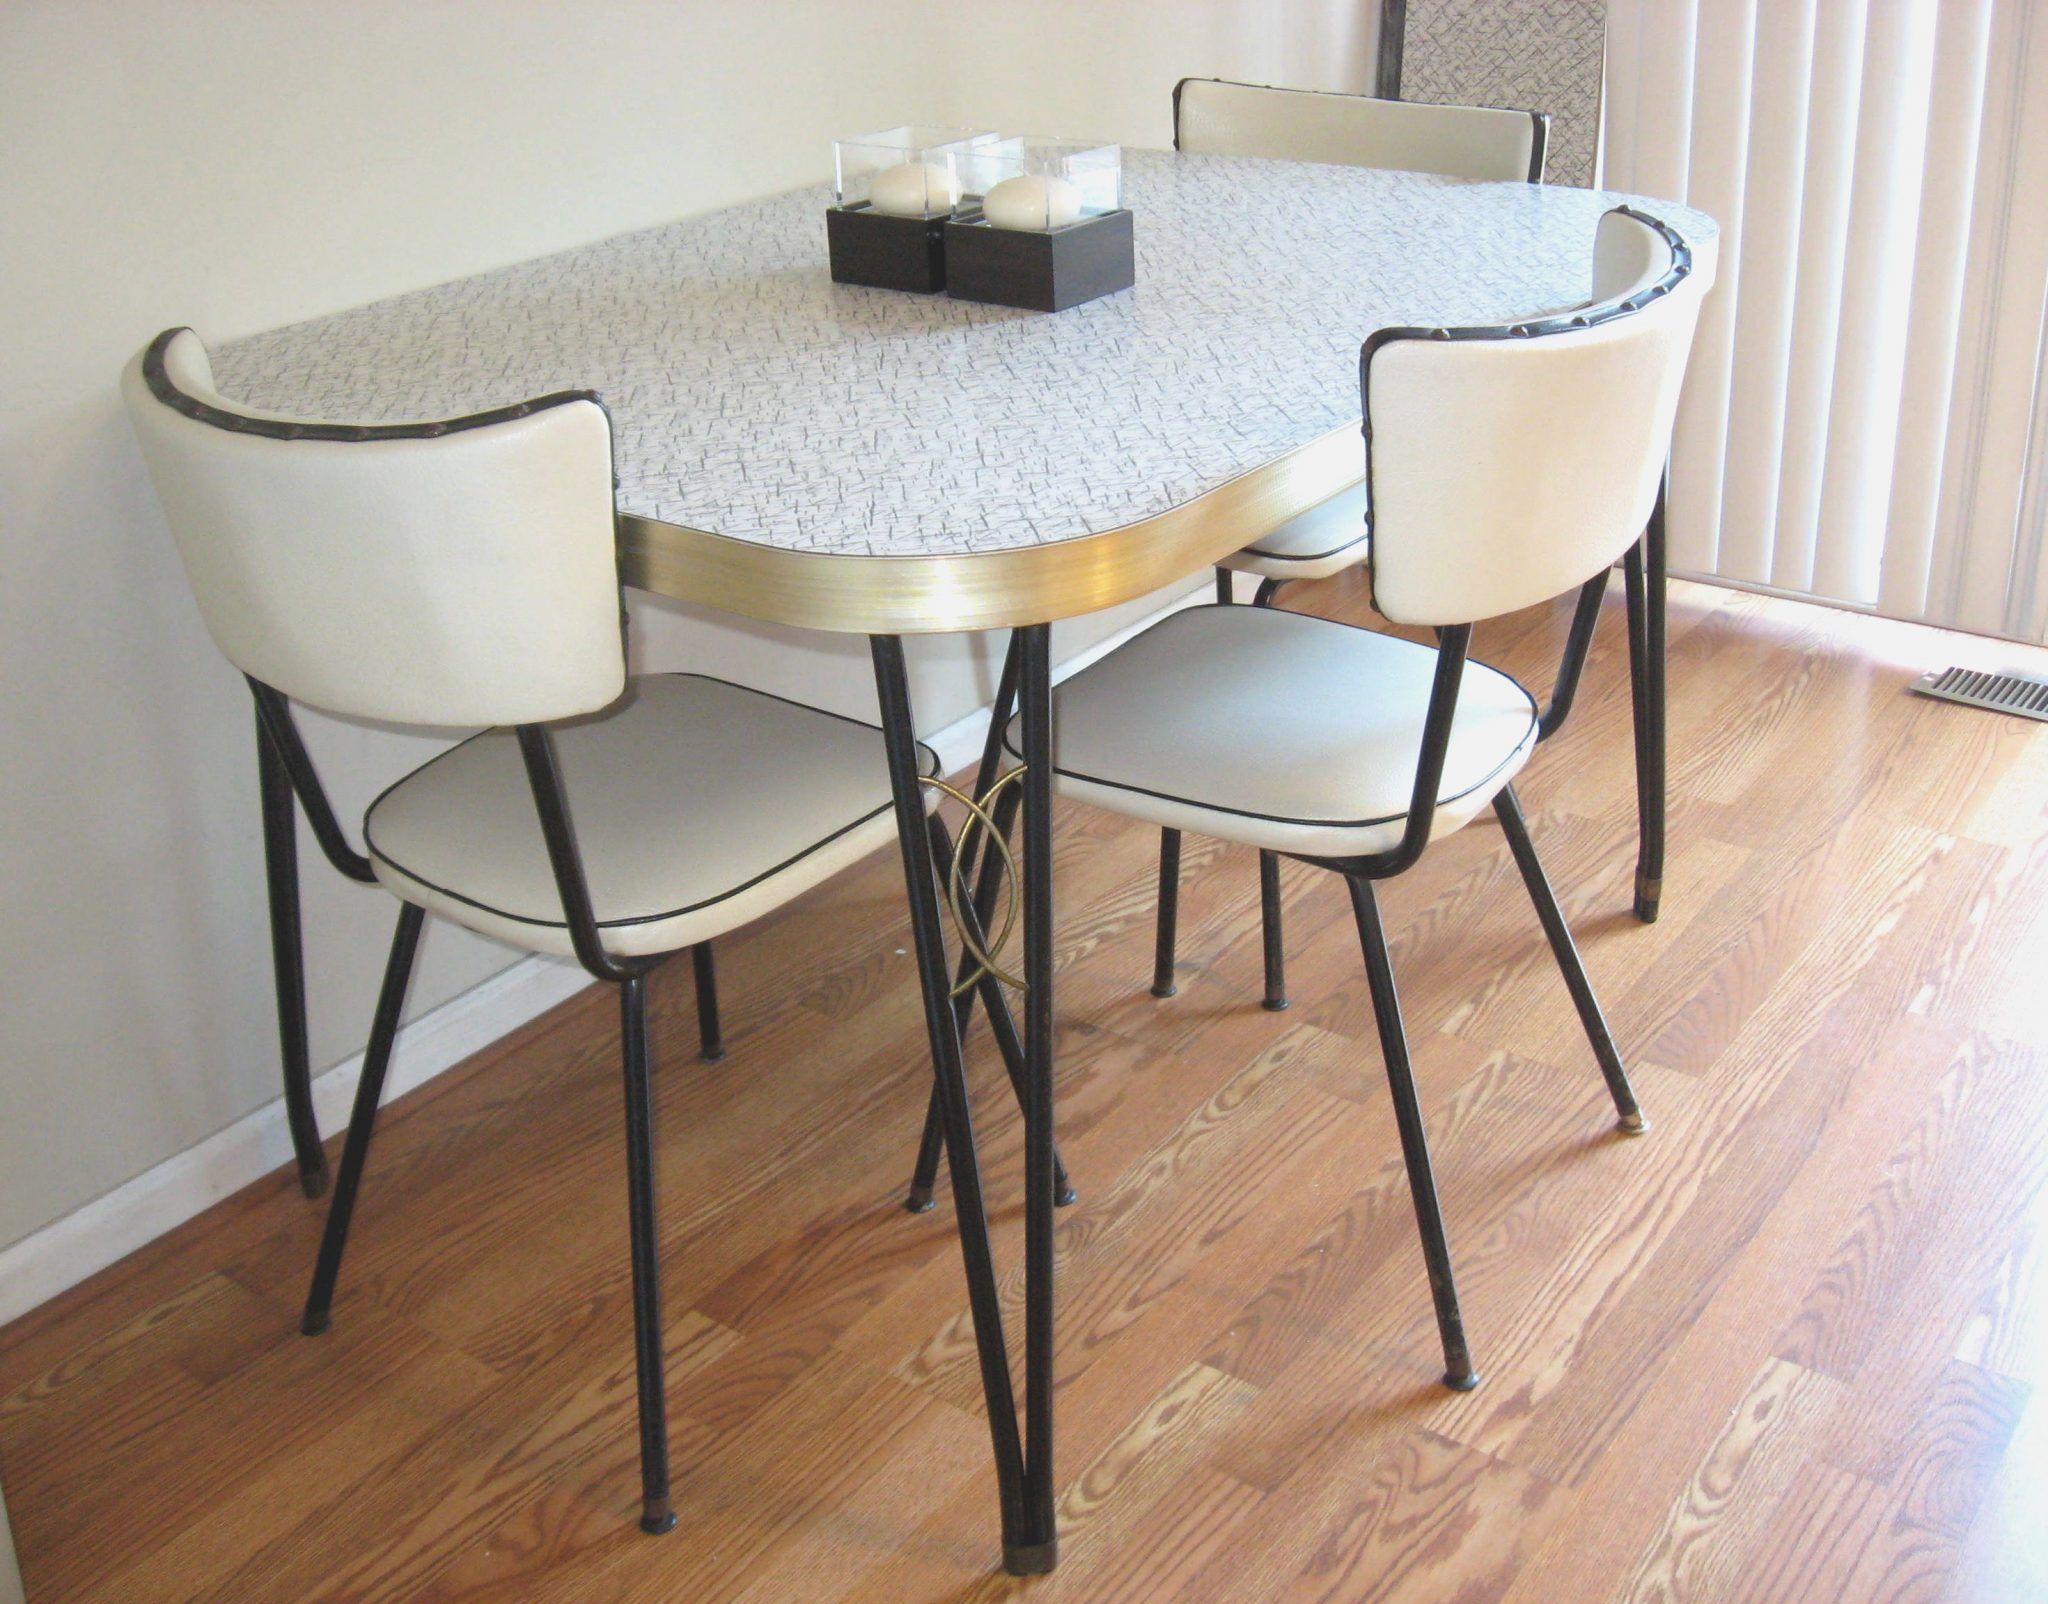 Kitchen Chairs Set Of 4 Kitchen Chair Cushions Set Of 4 Kitchen